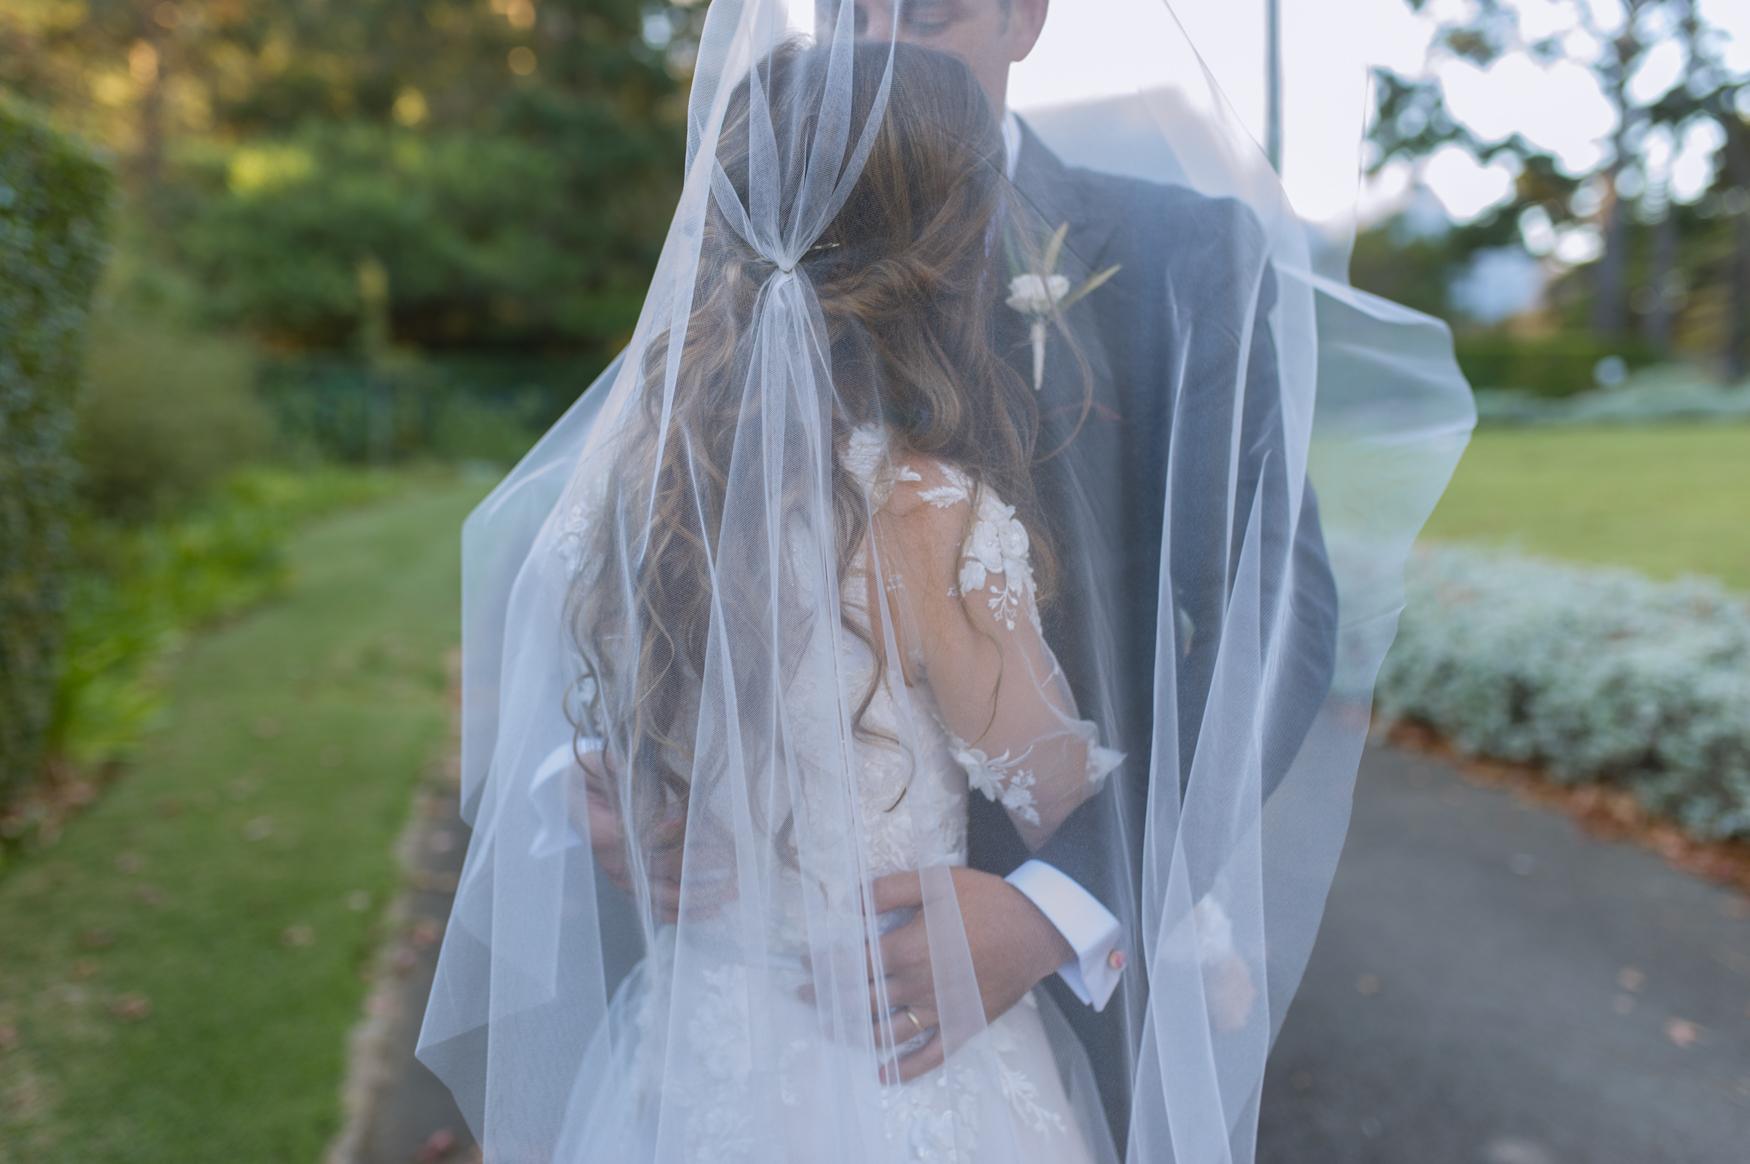 Leon_&_Martine's_Wedding_Photographs_17th_April_2019_@johnhenryweddingphoto_Low_Resolution_Web-396.JPG